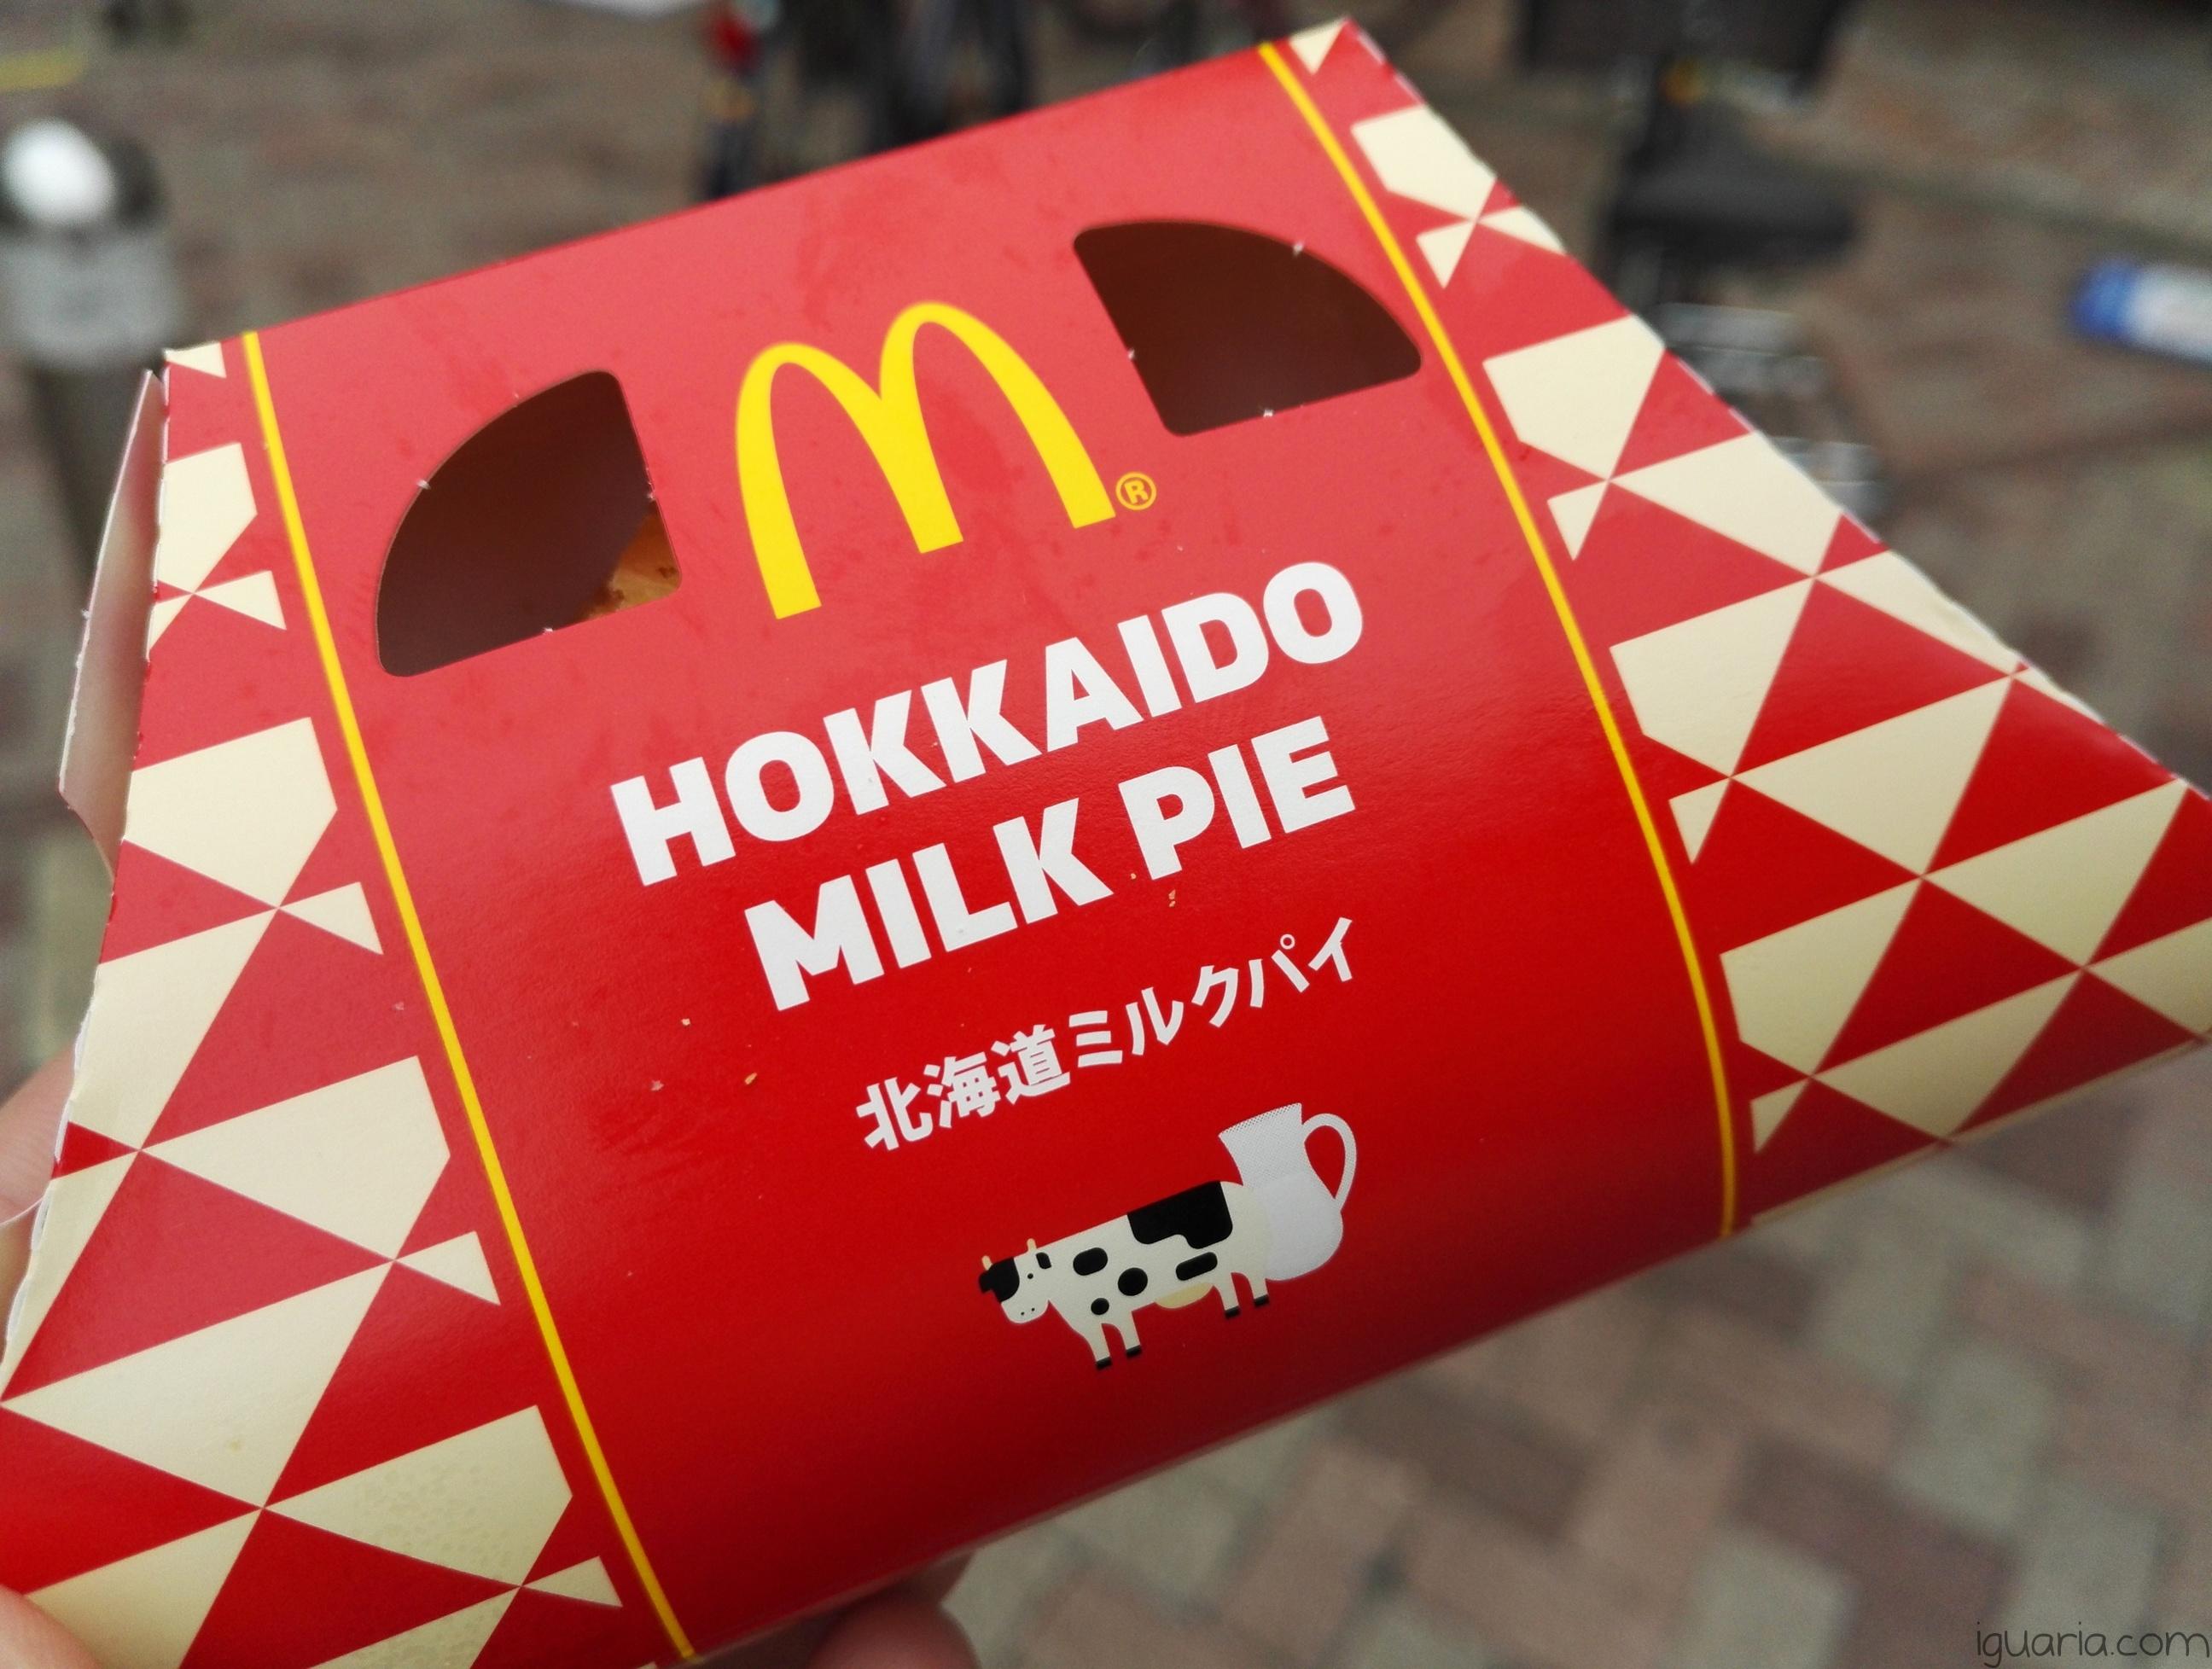 iguaria-macdonalds-hokkaido-milk-pie